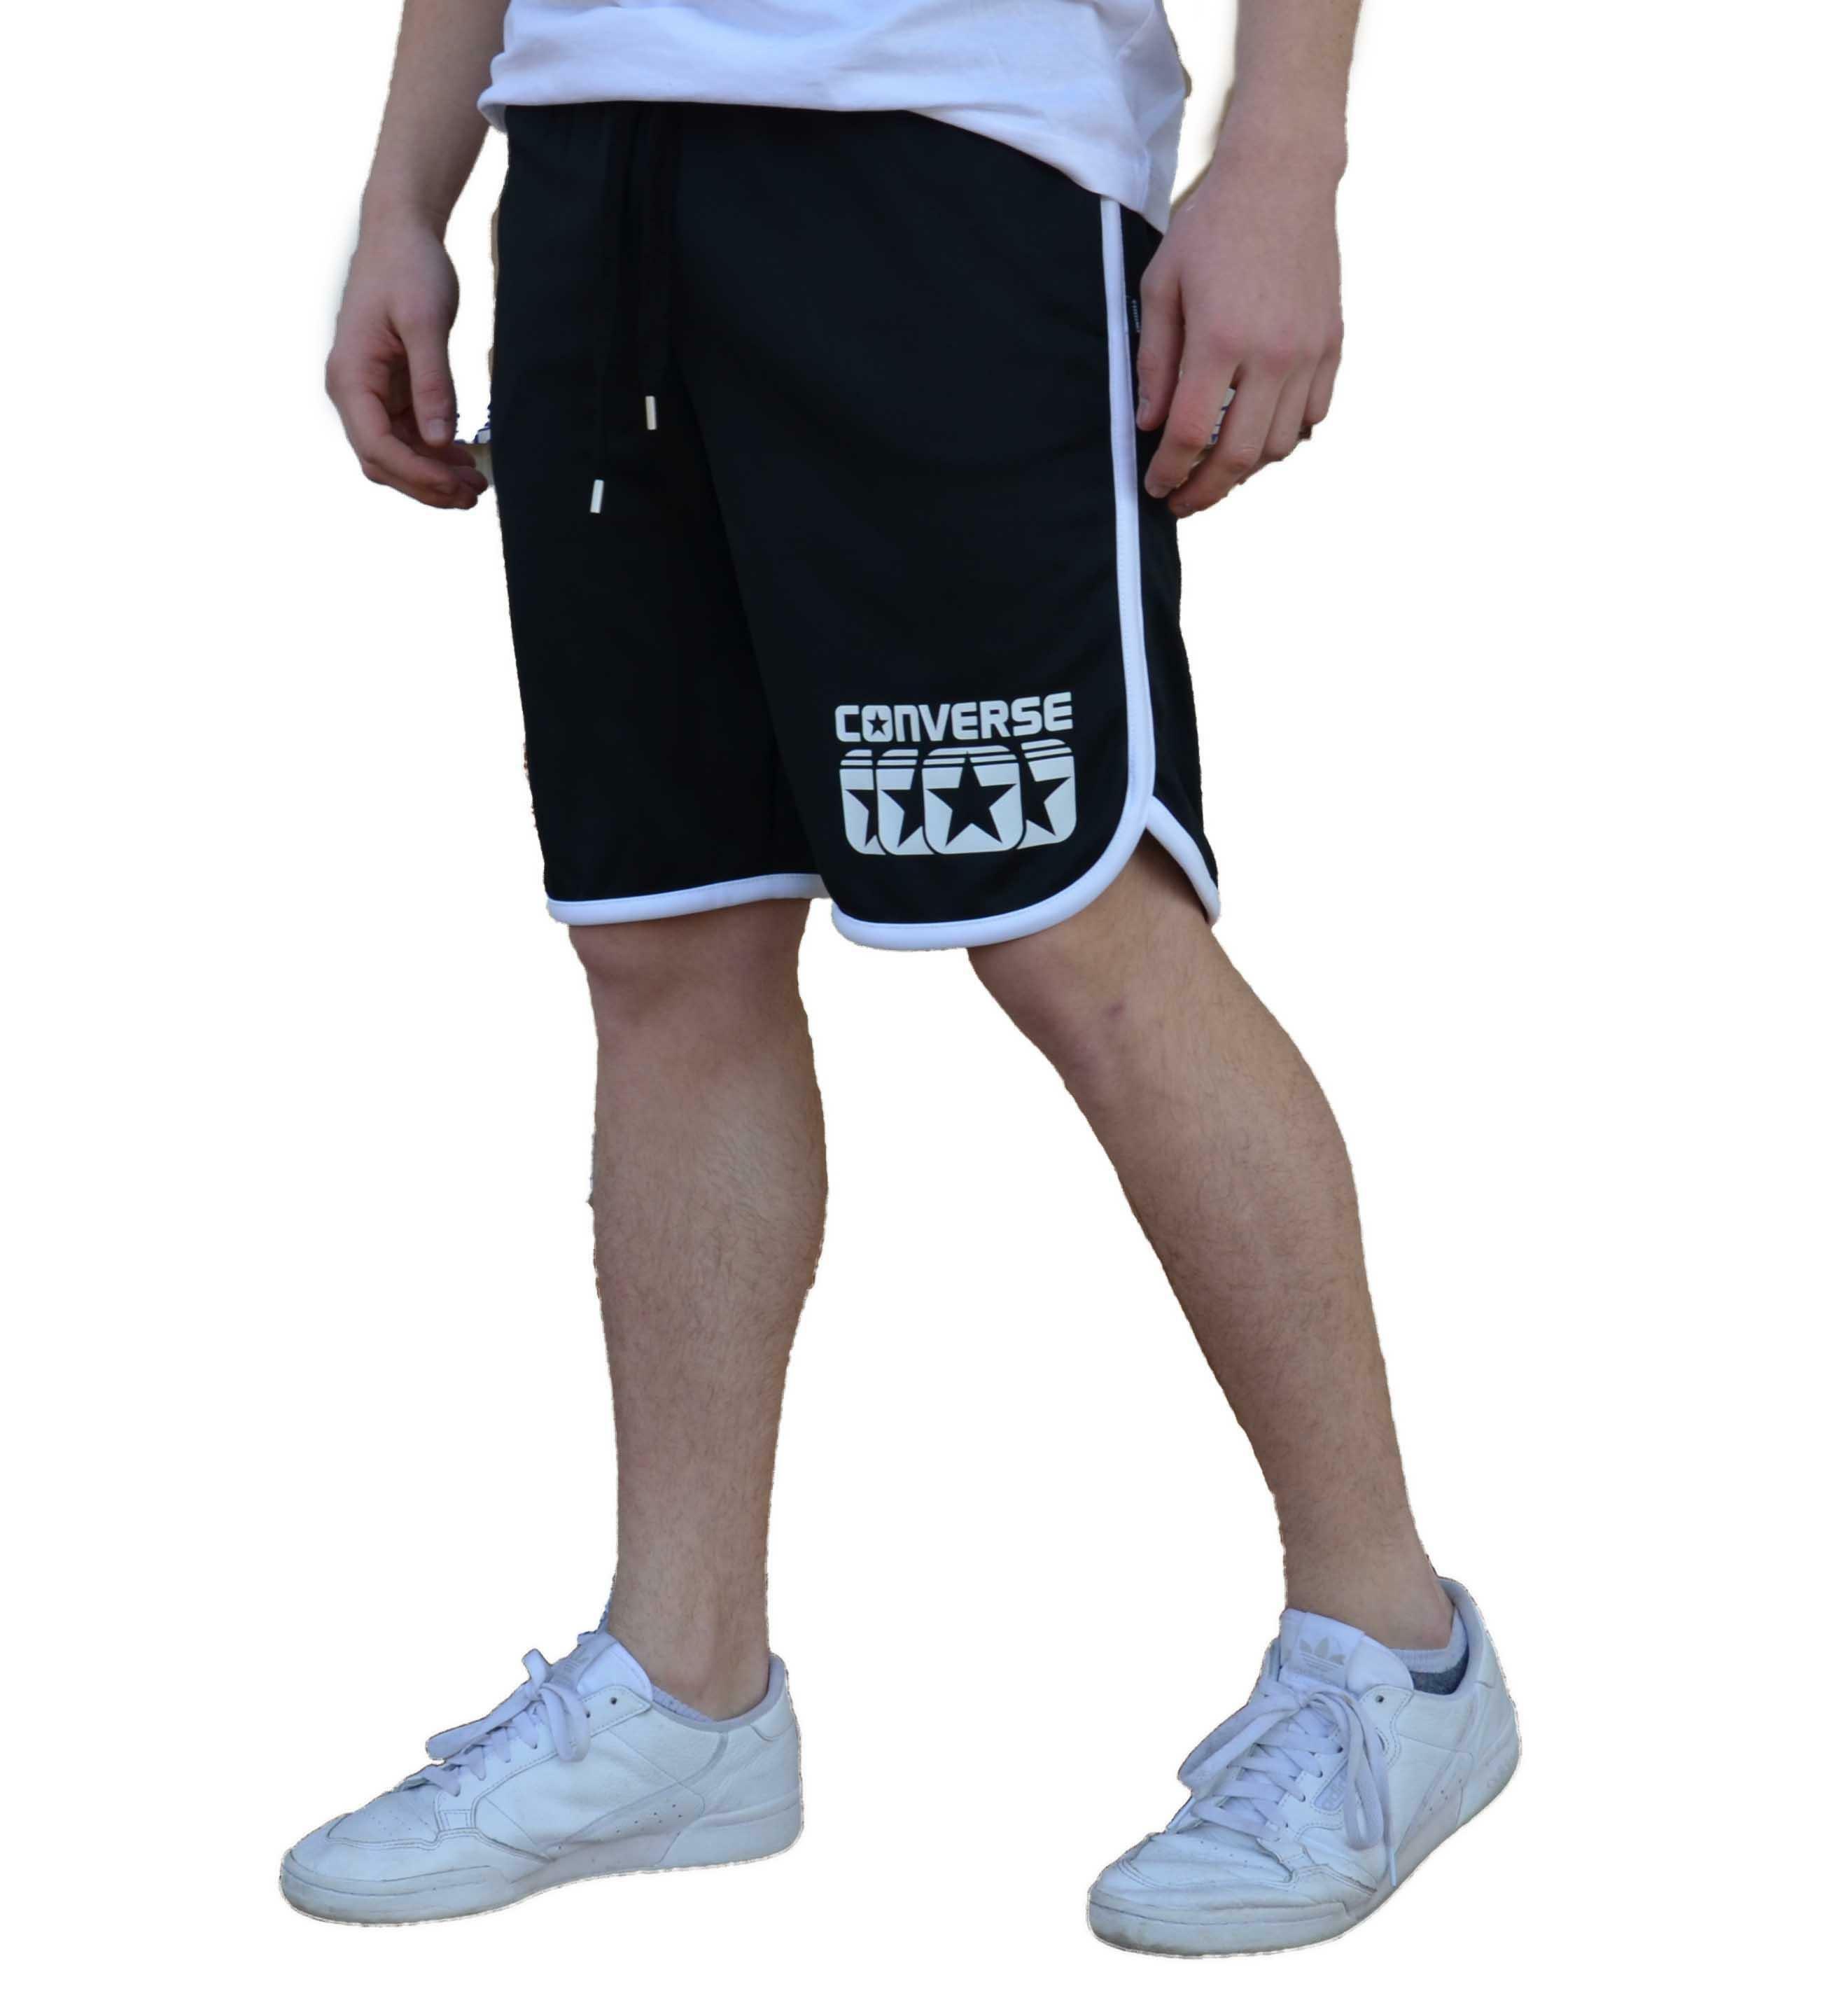 2converse pantaloncini uomo